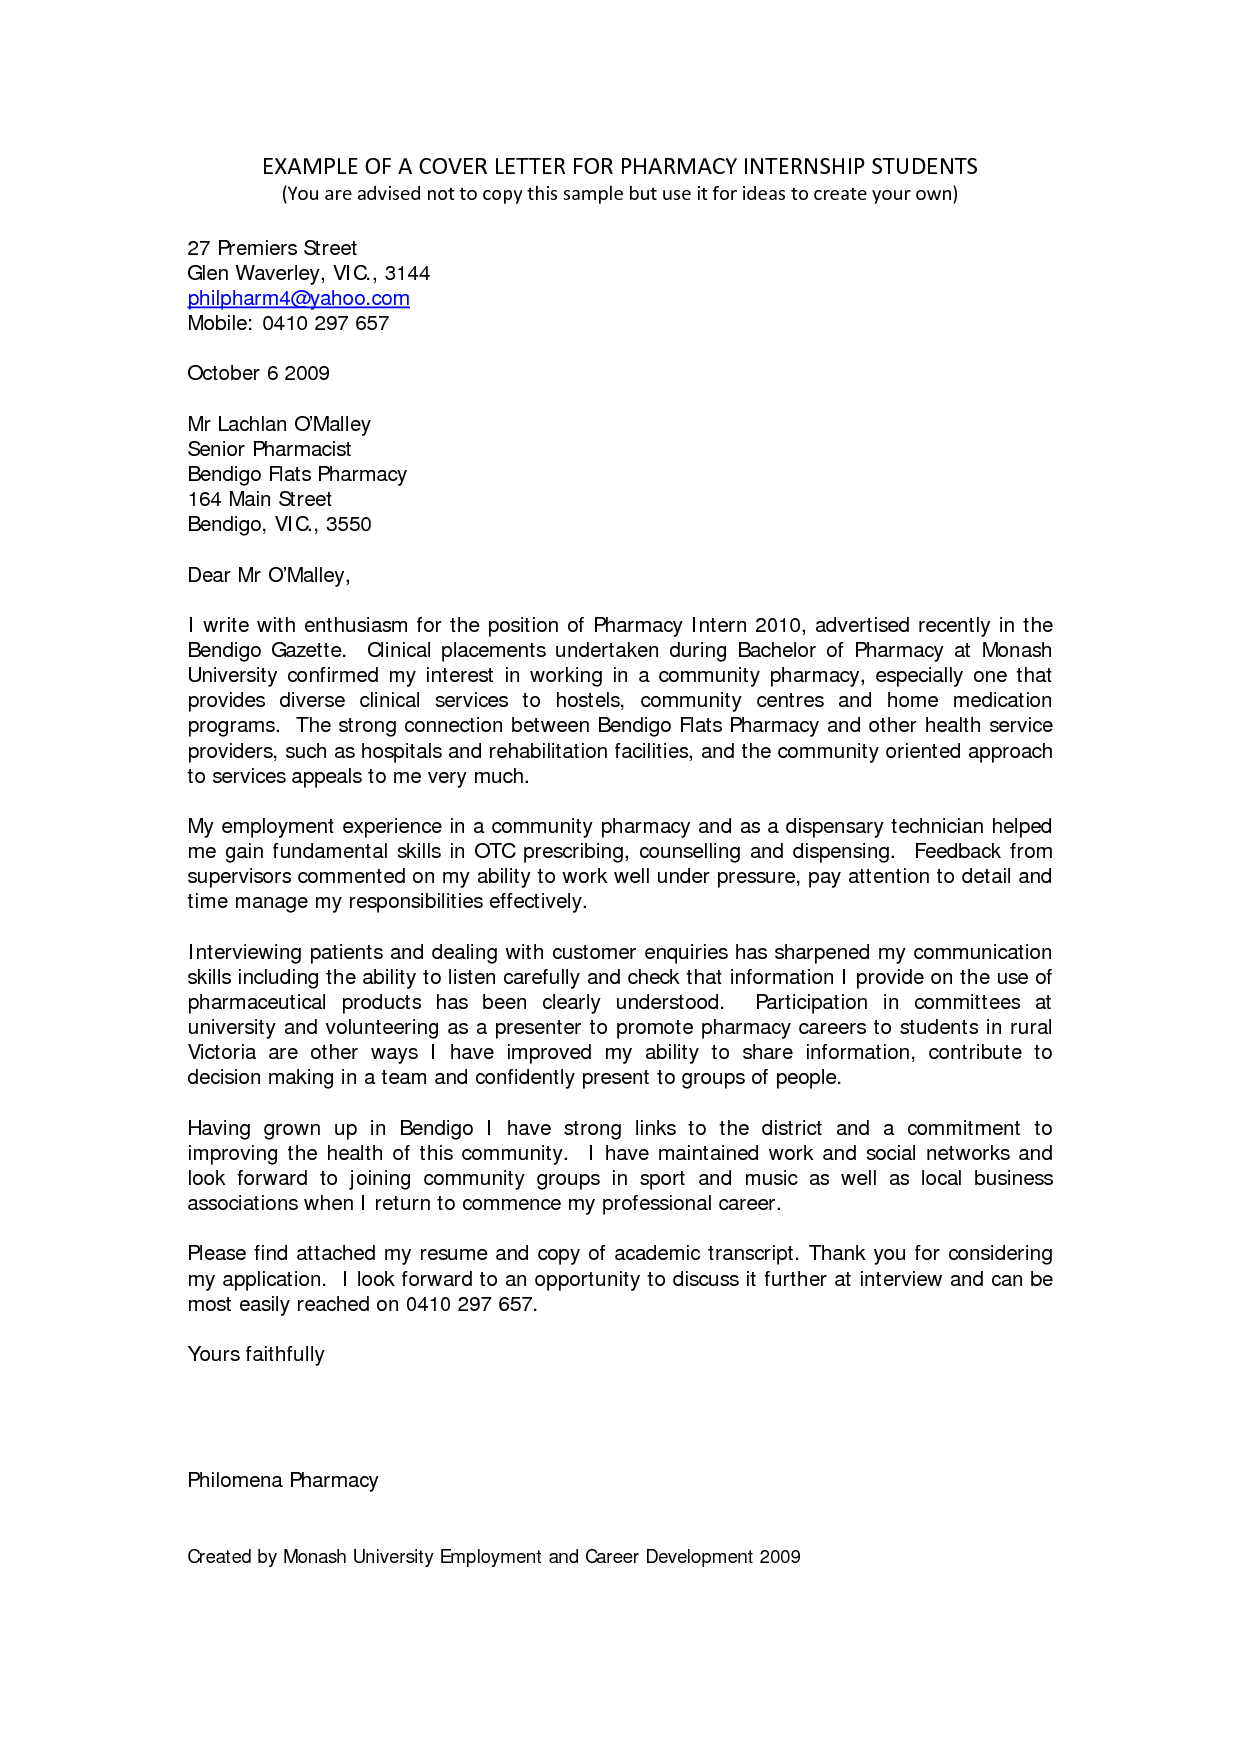 excellent cover letter Cover letter for internship